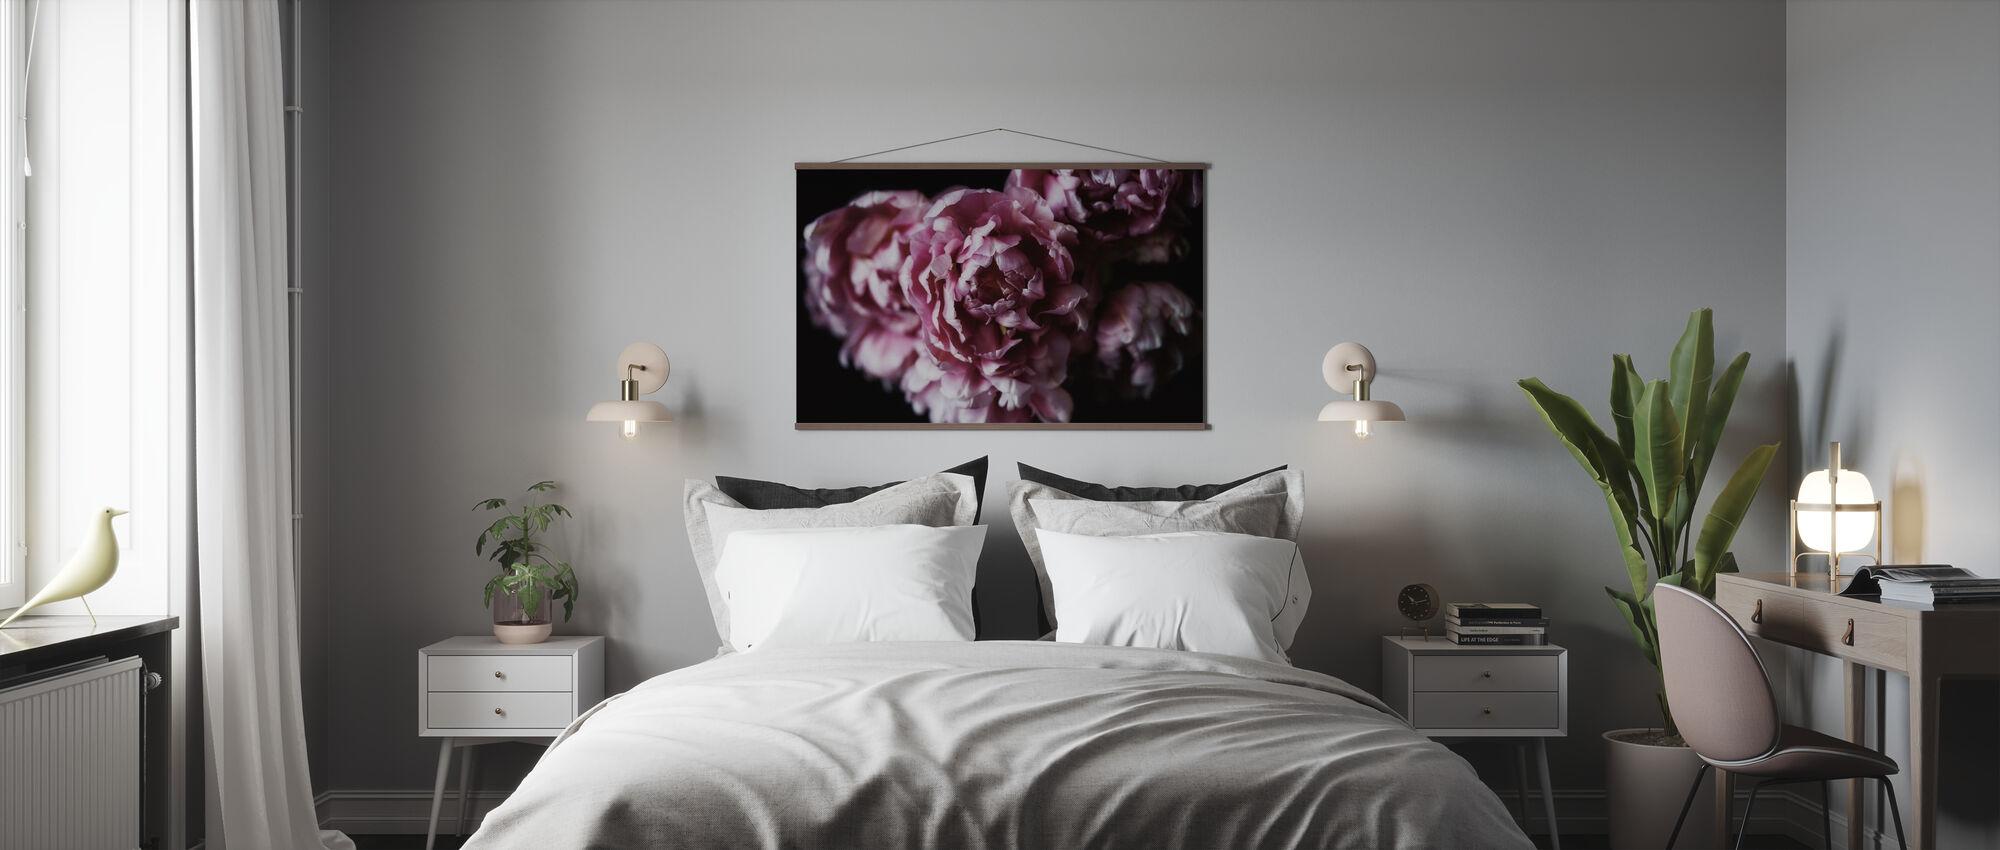 Pink Double Tulips - Poster - Bedroom